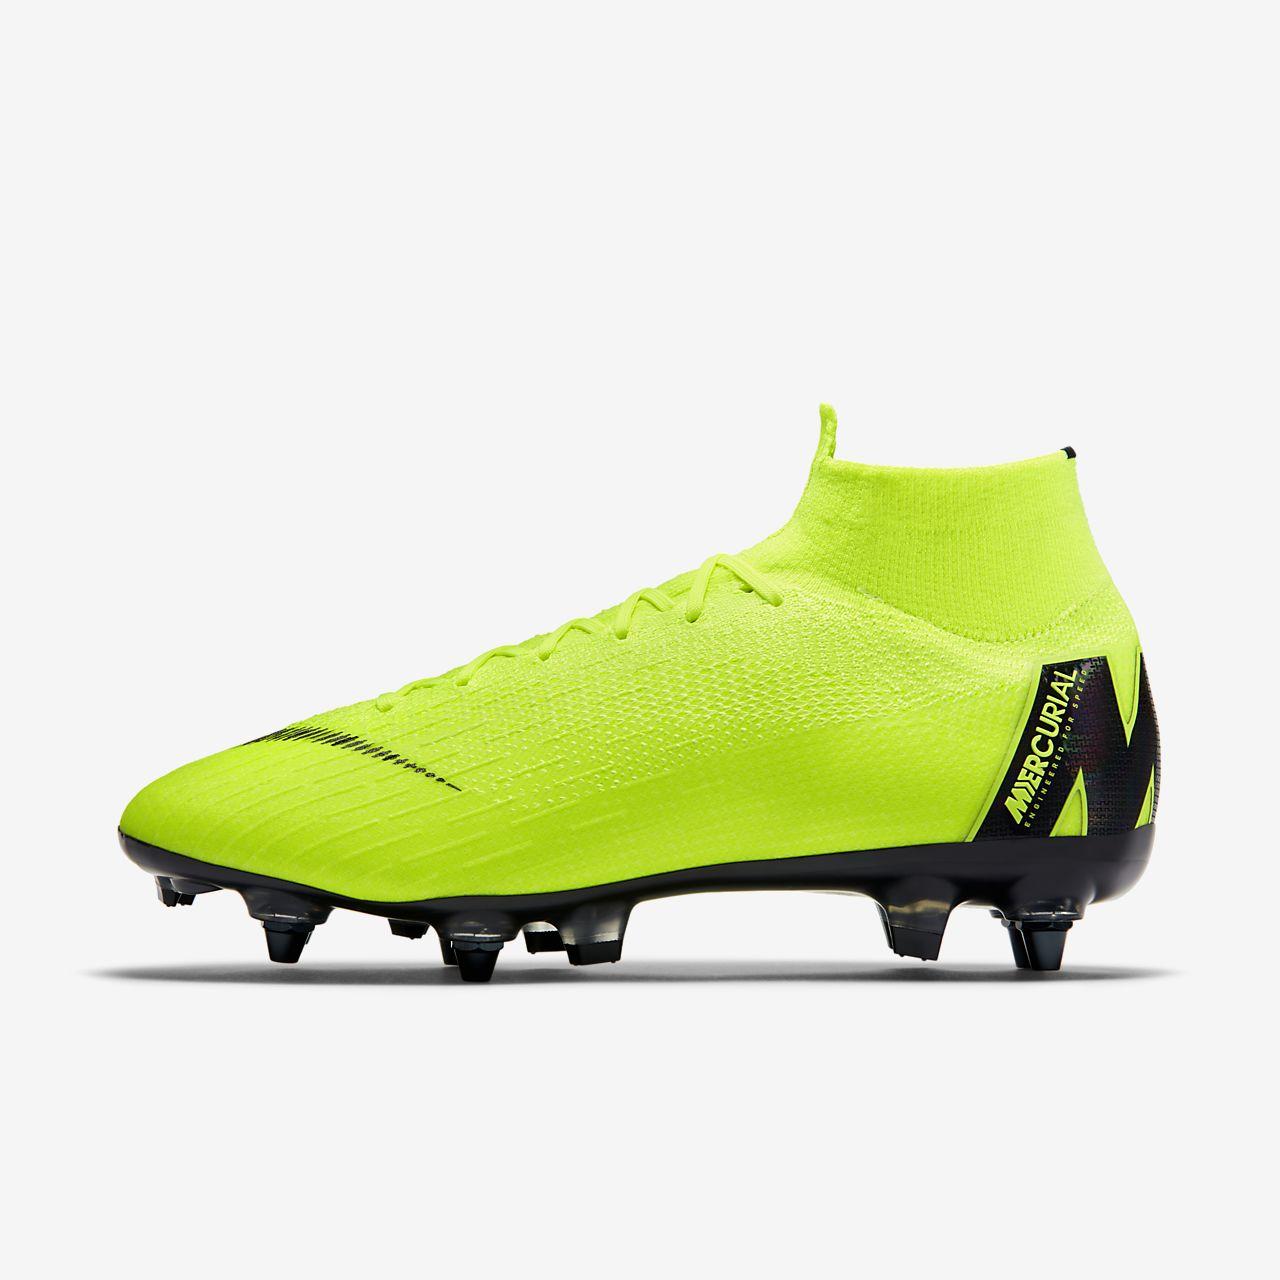 Nike Mercurial Superfly 360 Elite SG-PRO Anti-Clog Botes de futbol per a terreny tou